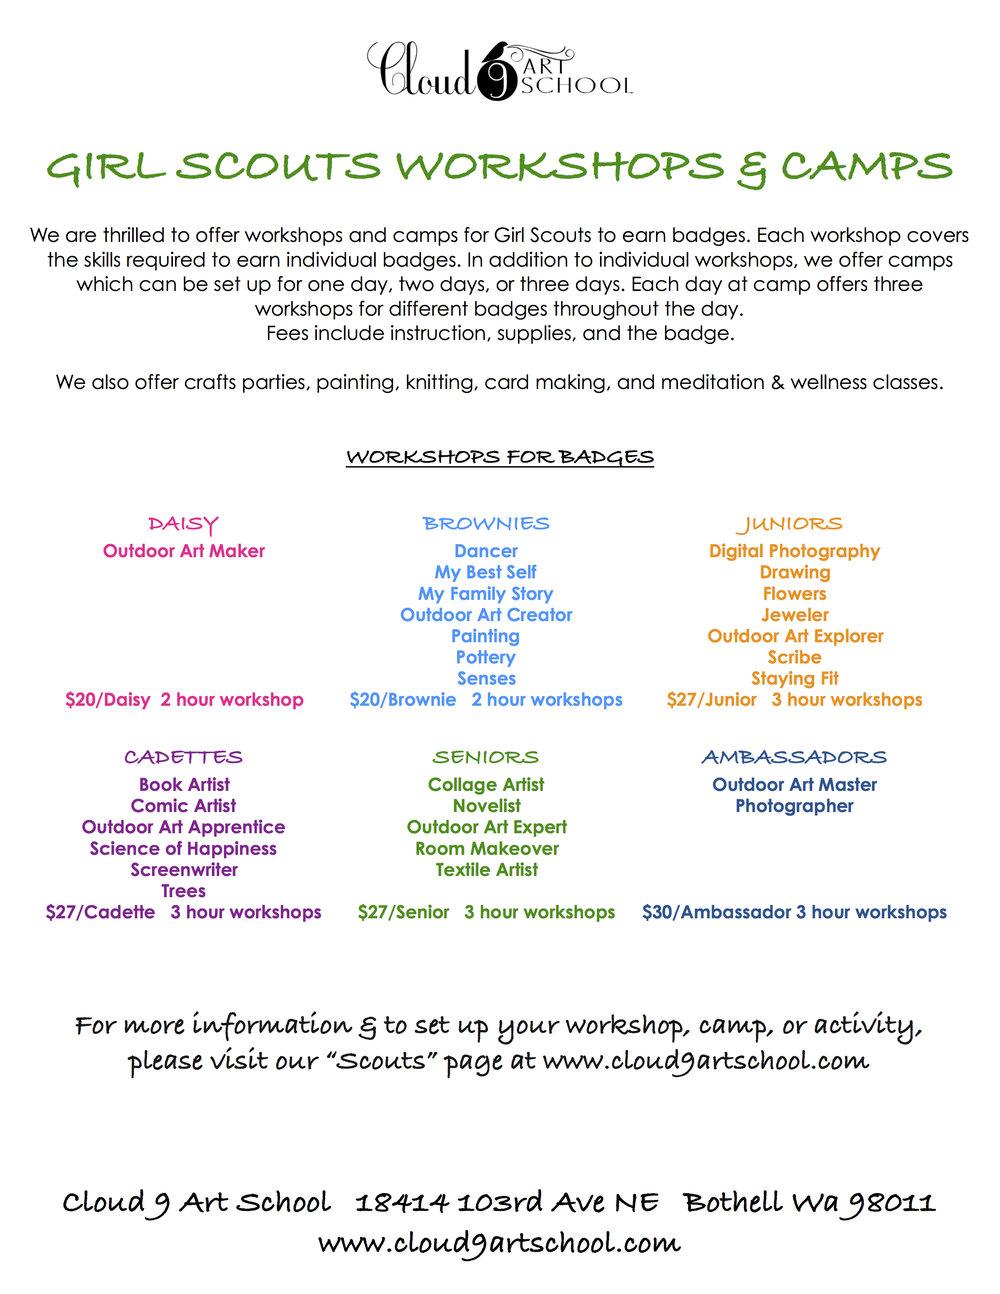 Girl scouts workshops camps classes cloud 9 girl scoutsg izmirmasajfo